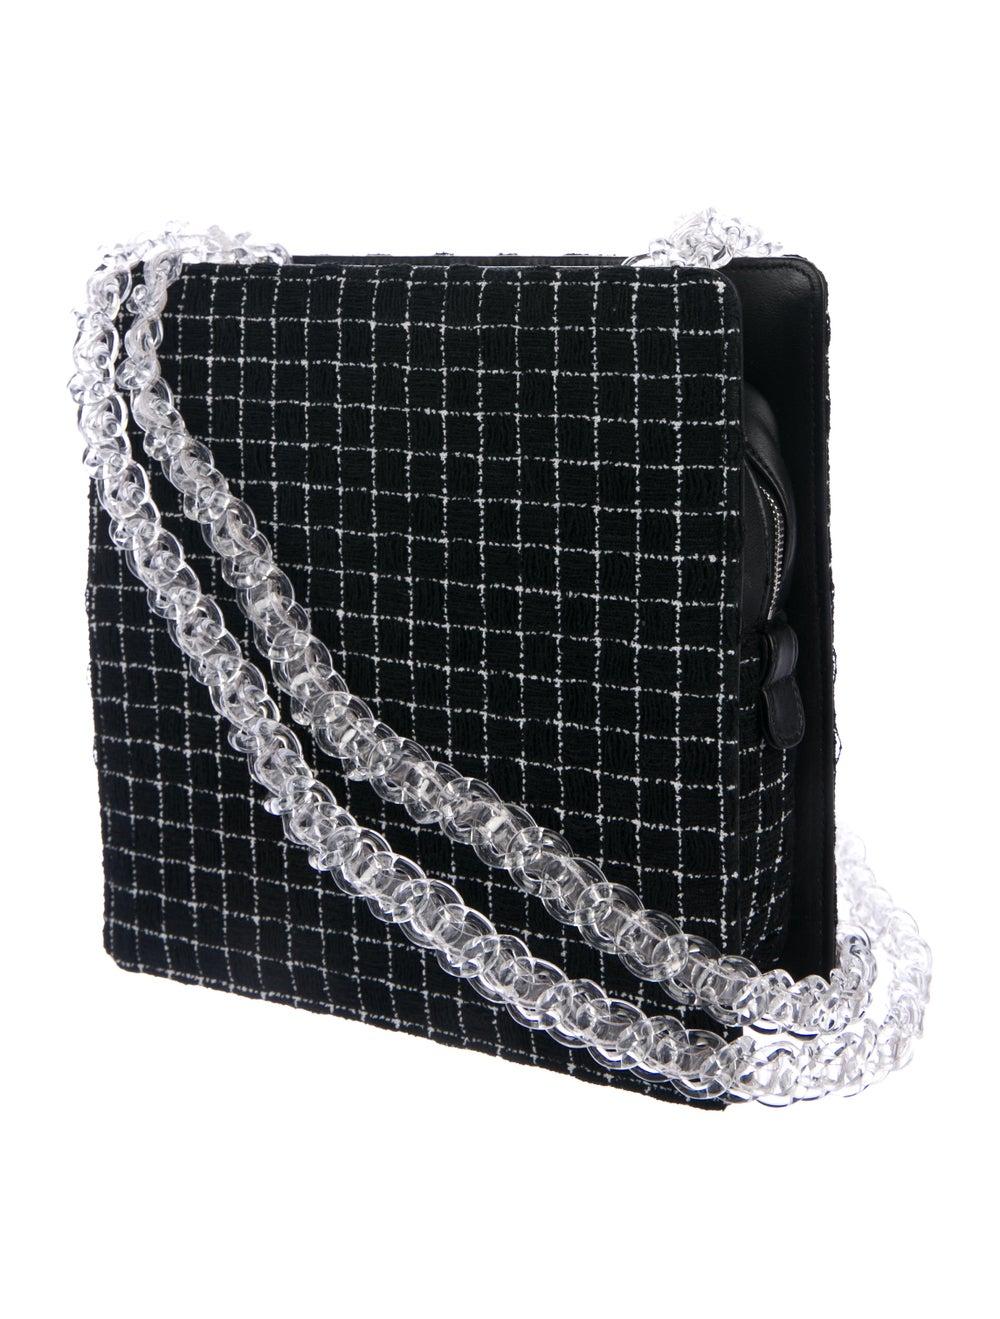 Chanel Chain Fantasy Tweed Bag Black - image 3